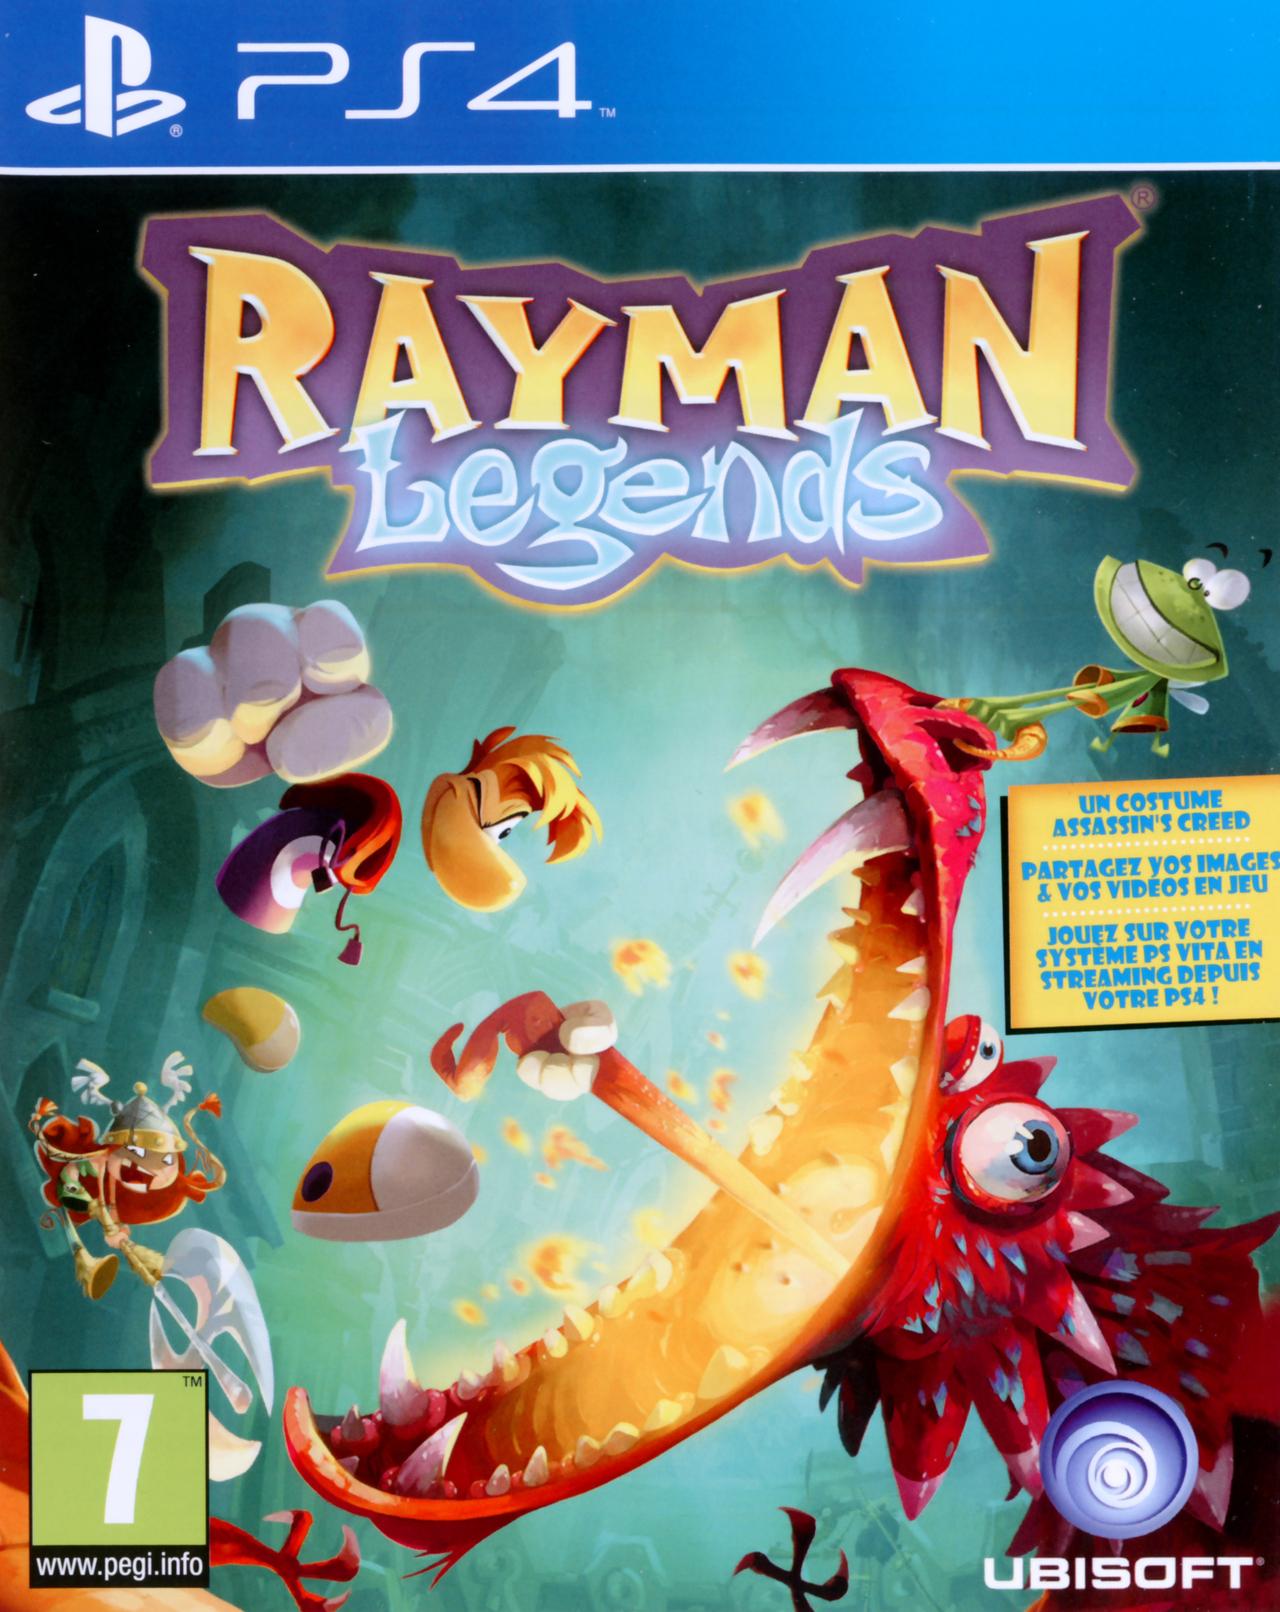 Jeux vid o rayman legends playstation 4 ps4 d 39 occasion - Jeux en ligne ps4 ...